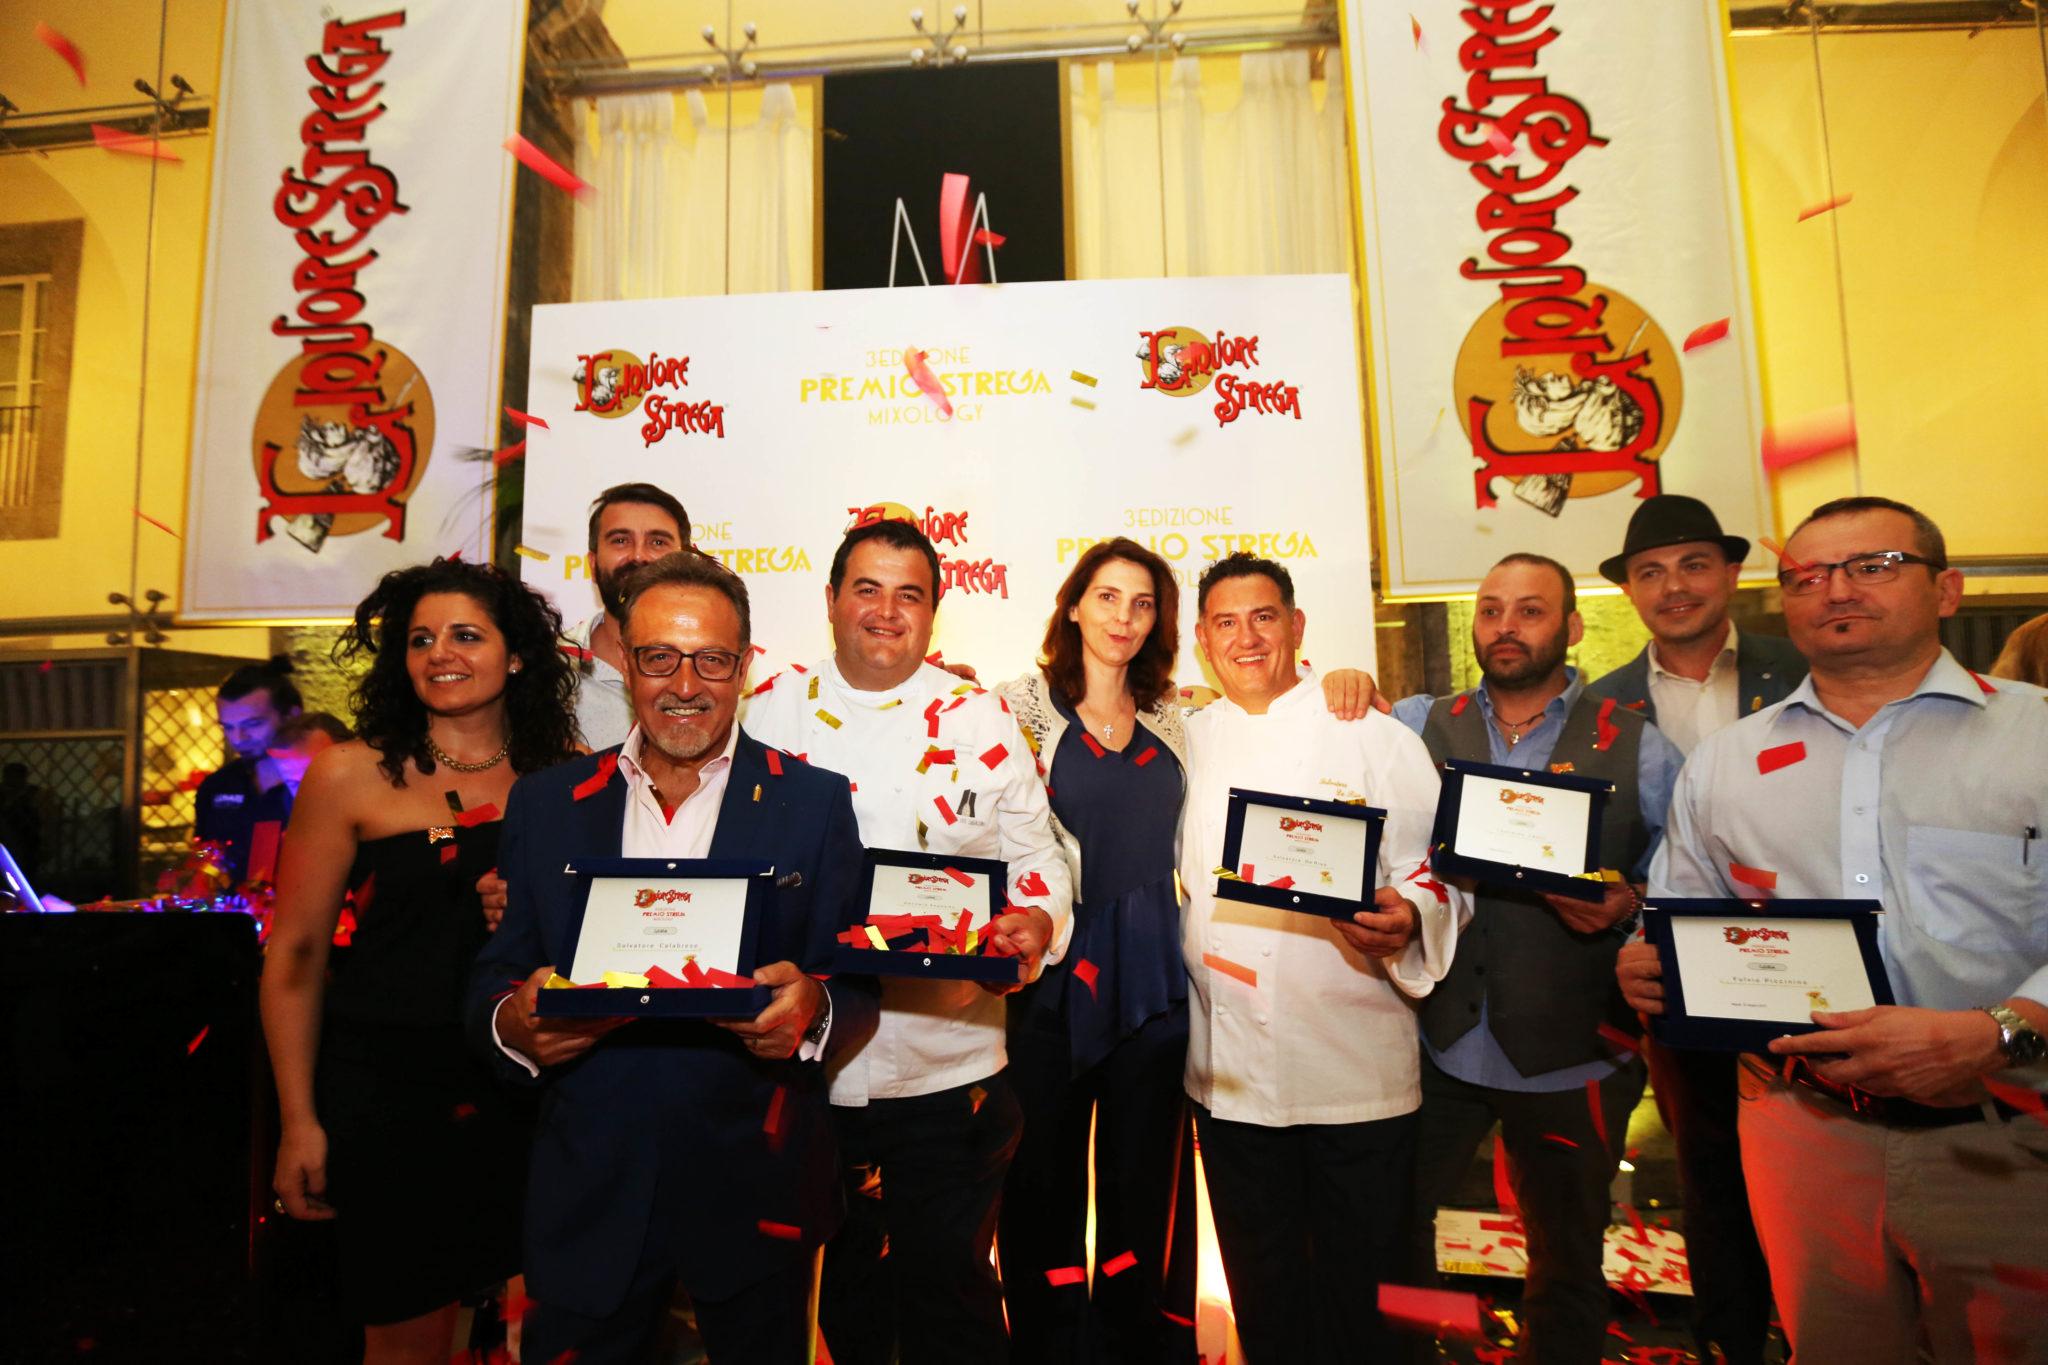 vincitore 3 premio strega mixology